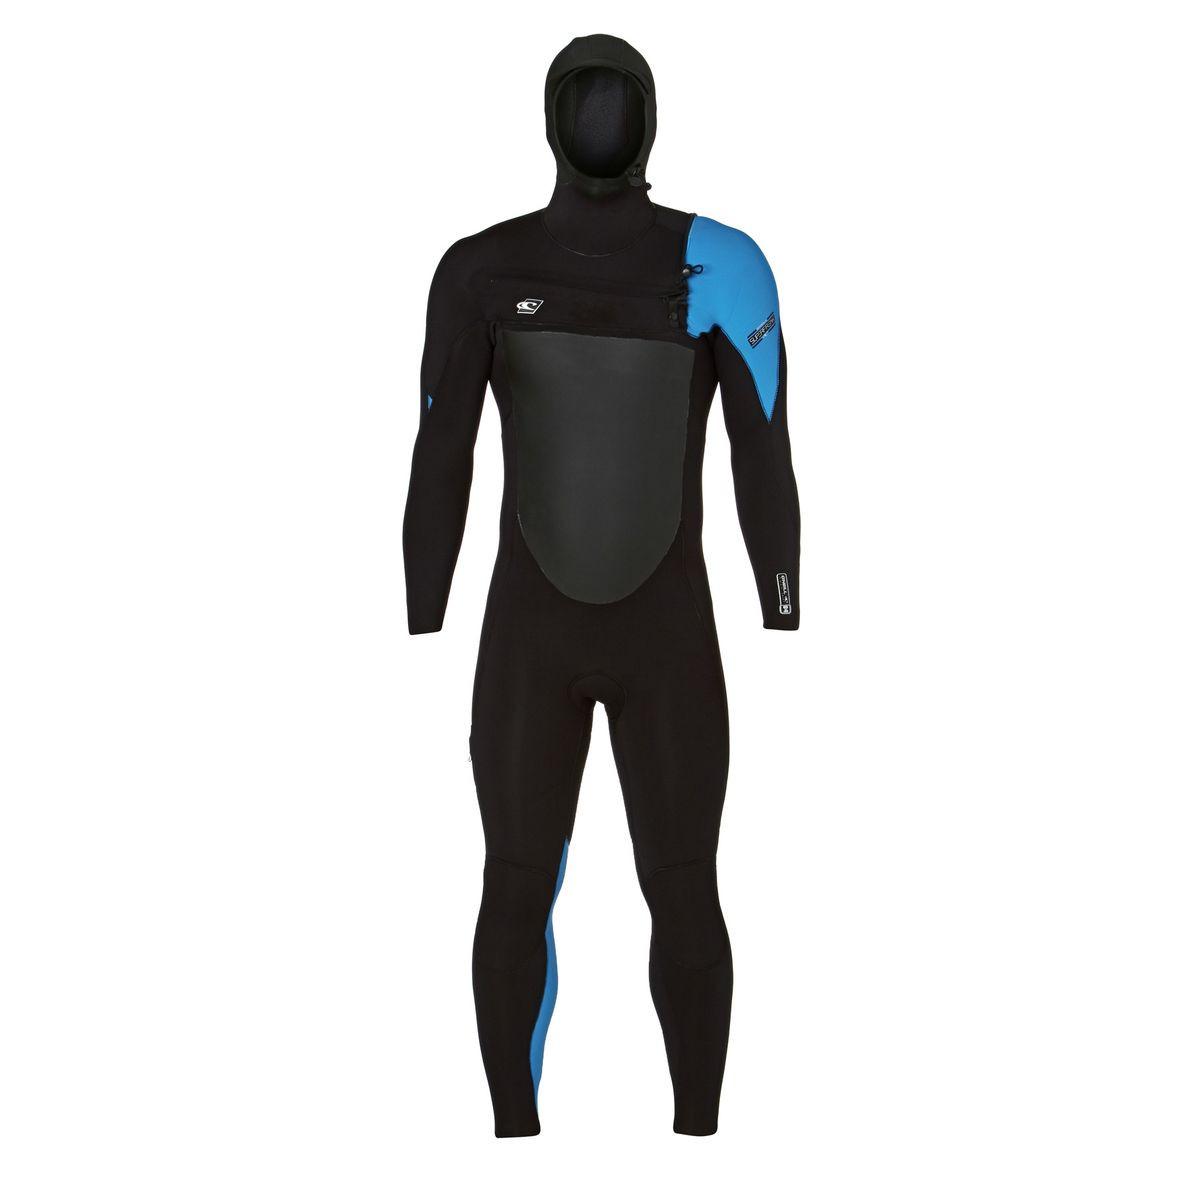 O'Neill Superfreak 6/4mm 2017 Hooded Chest Zip Wetsuit - Black/ Black/ Bright Blue